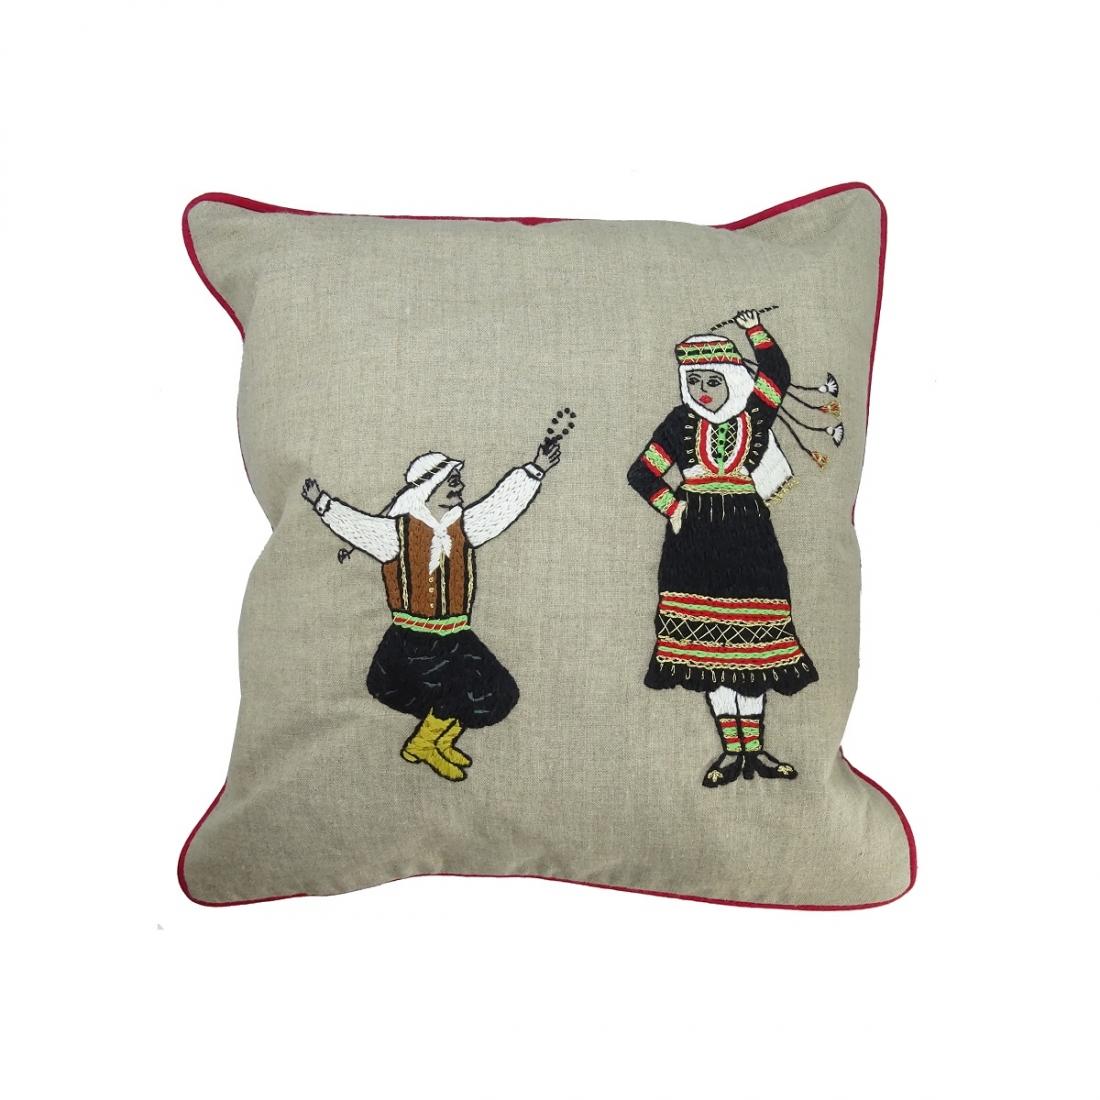 Shamaly Dabke' Hand-embroidered Fine Linen Cushion